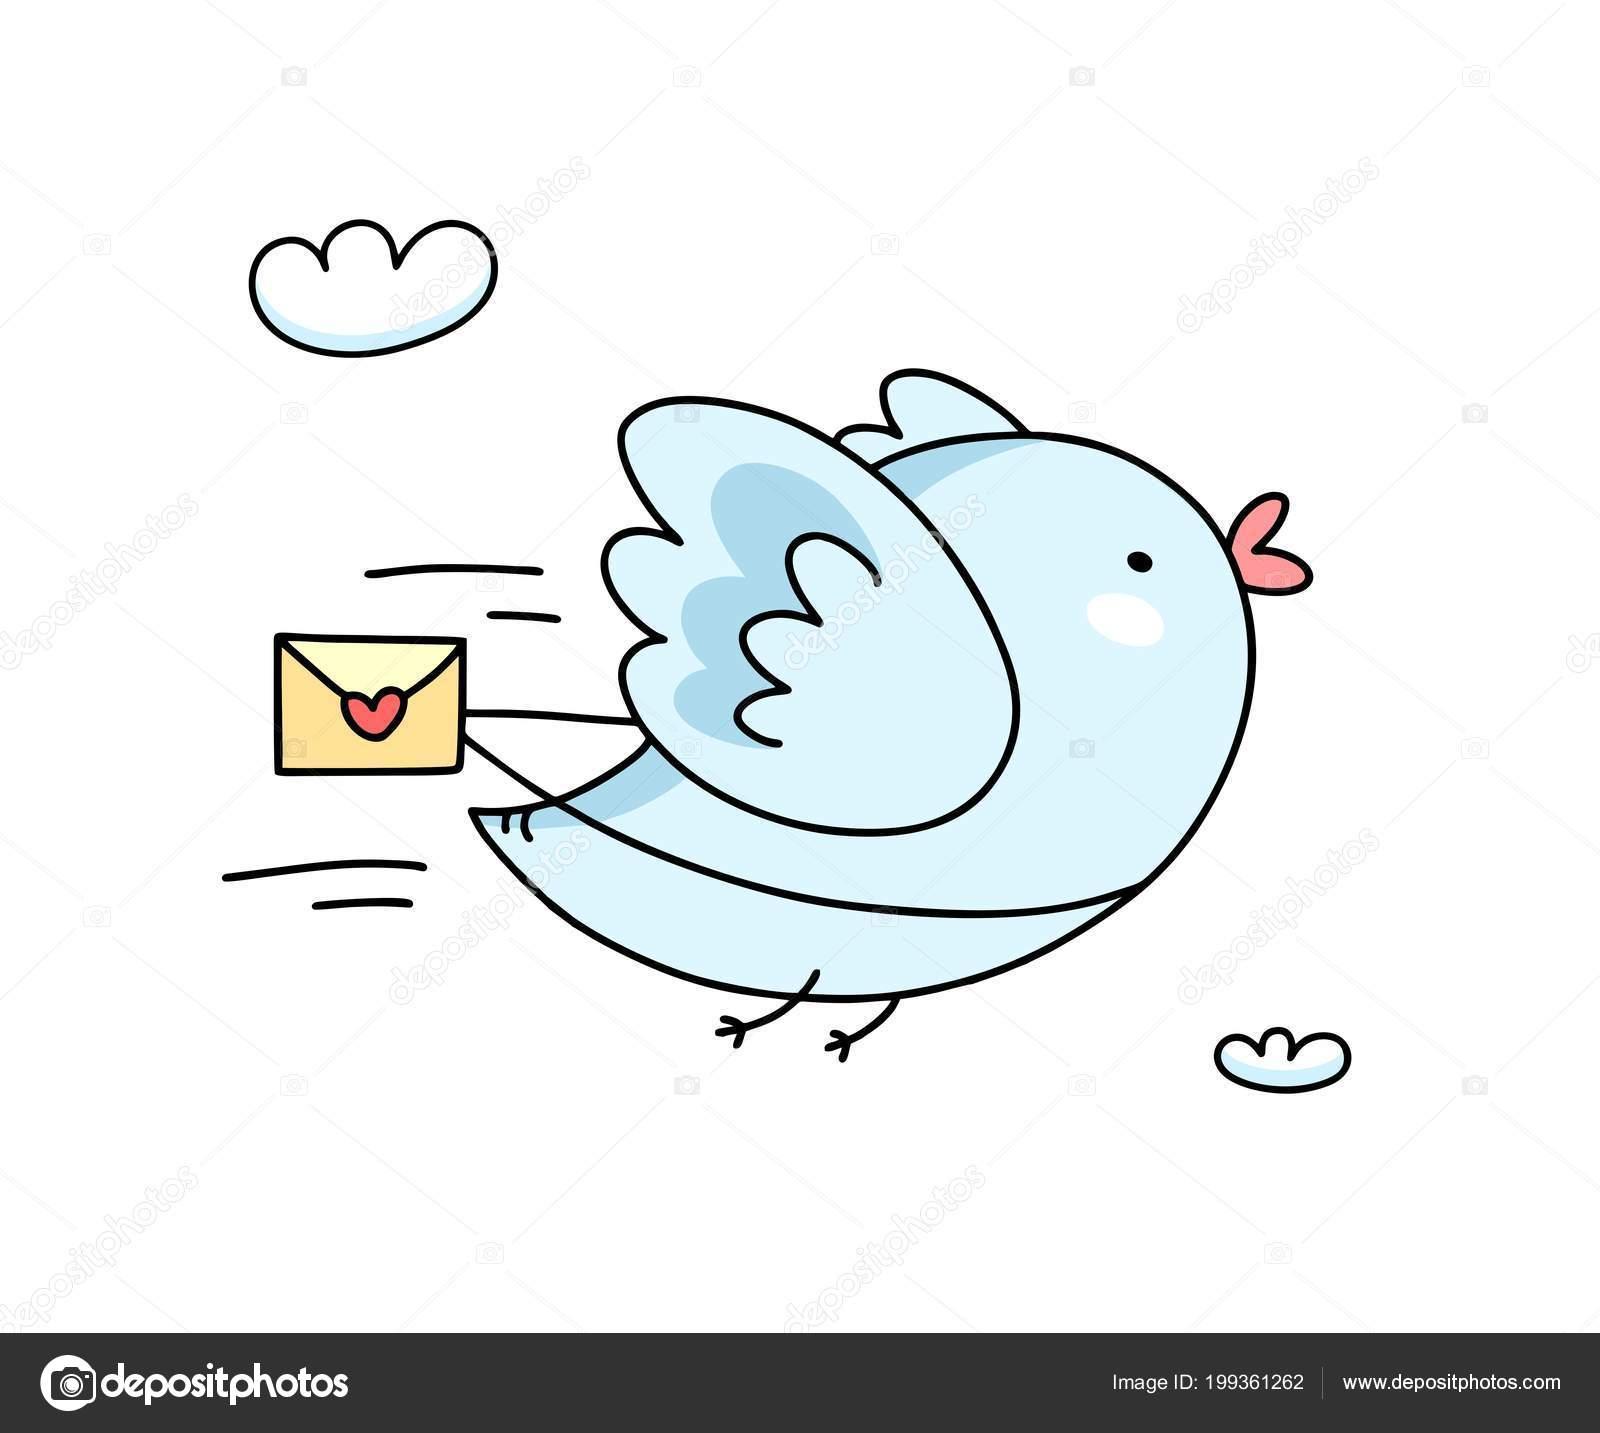 Imagenes Aves Animadas Tiernas Lindo Pajaro Azul Volando Con